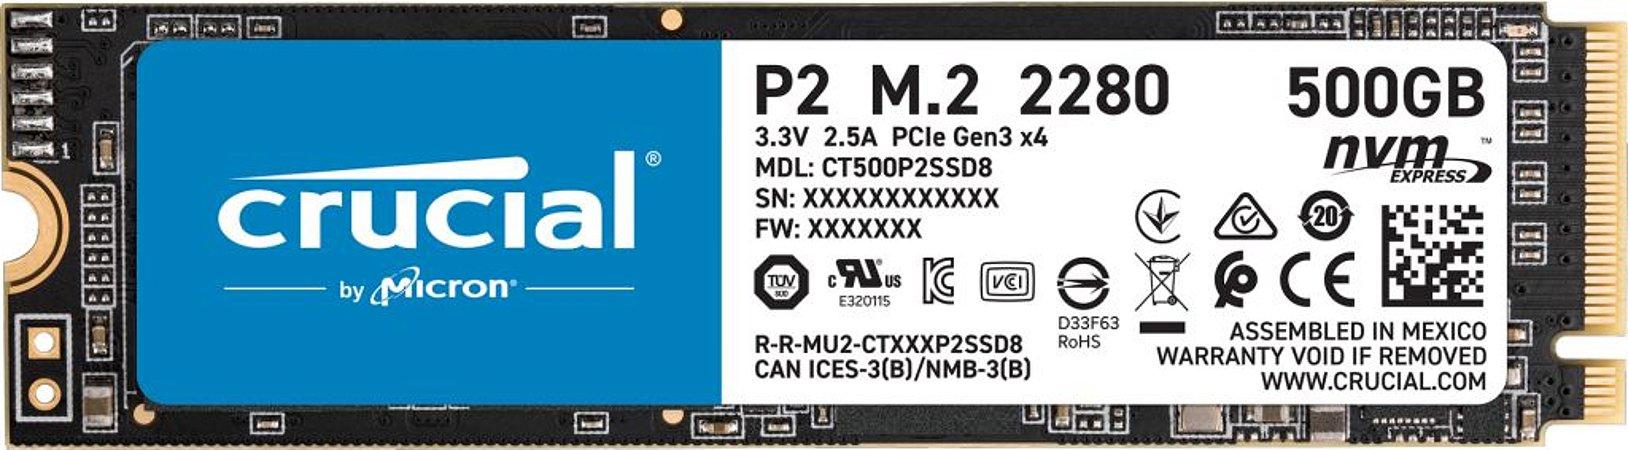 Hd SSD 500gb M.2 Nvme 2280 Crucial - CT500P2SSD8